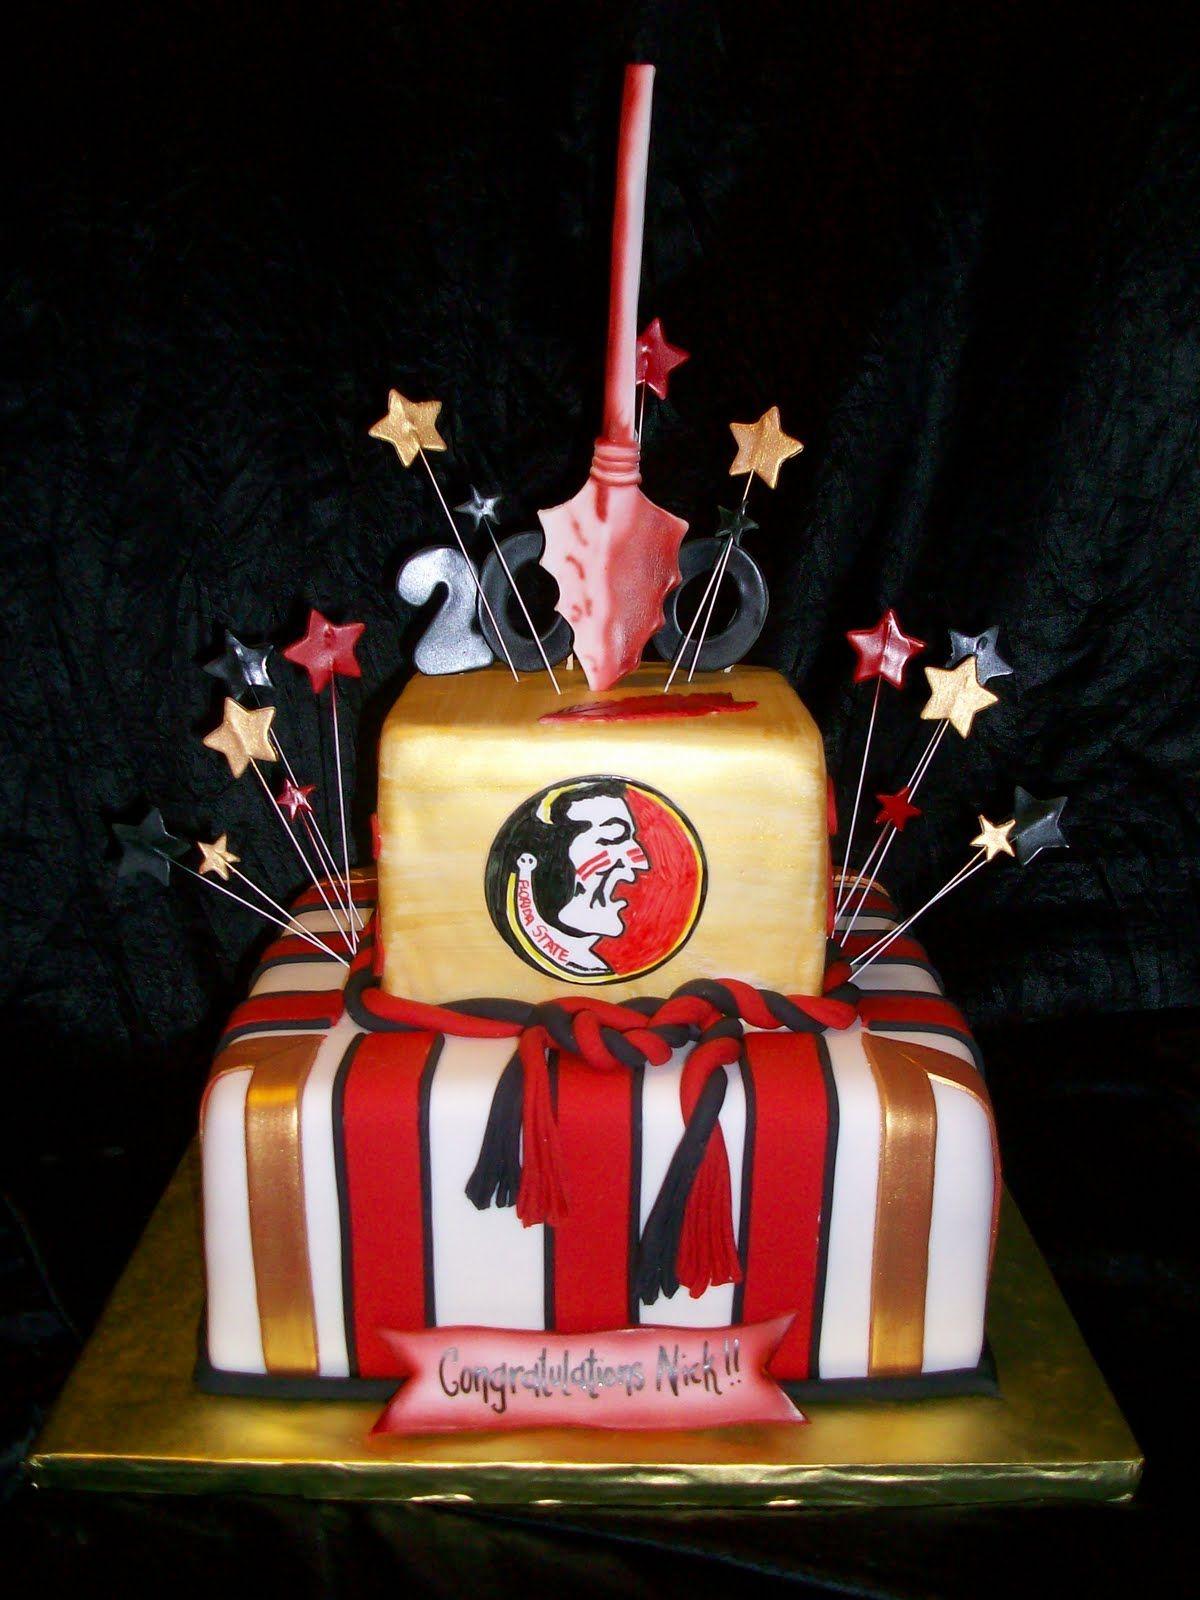 High School Graduation Cakes Sandras Cakes Graduation Cakes